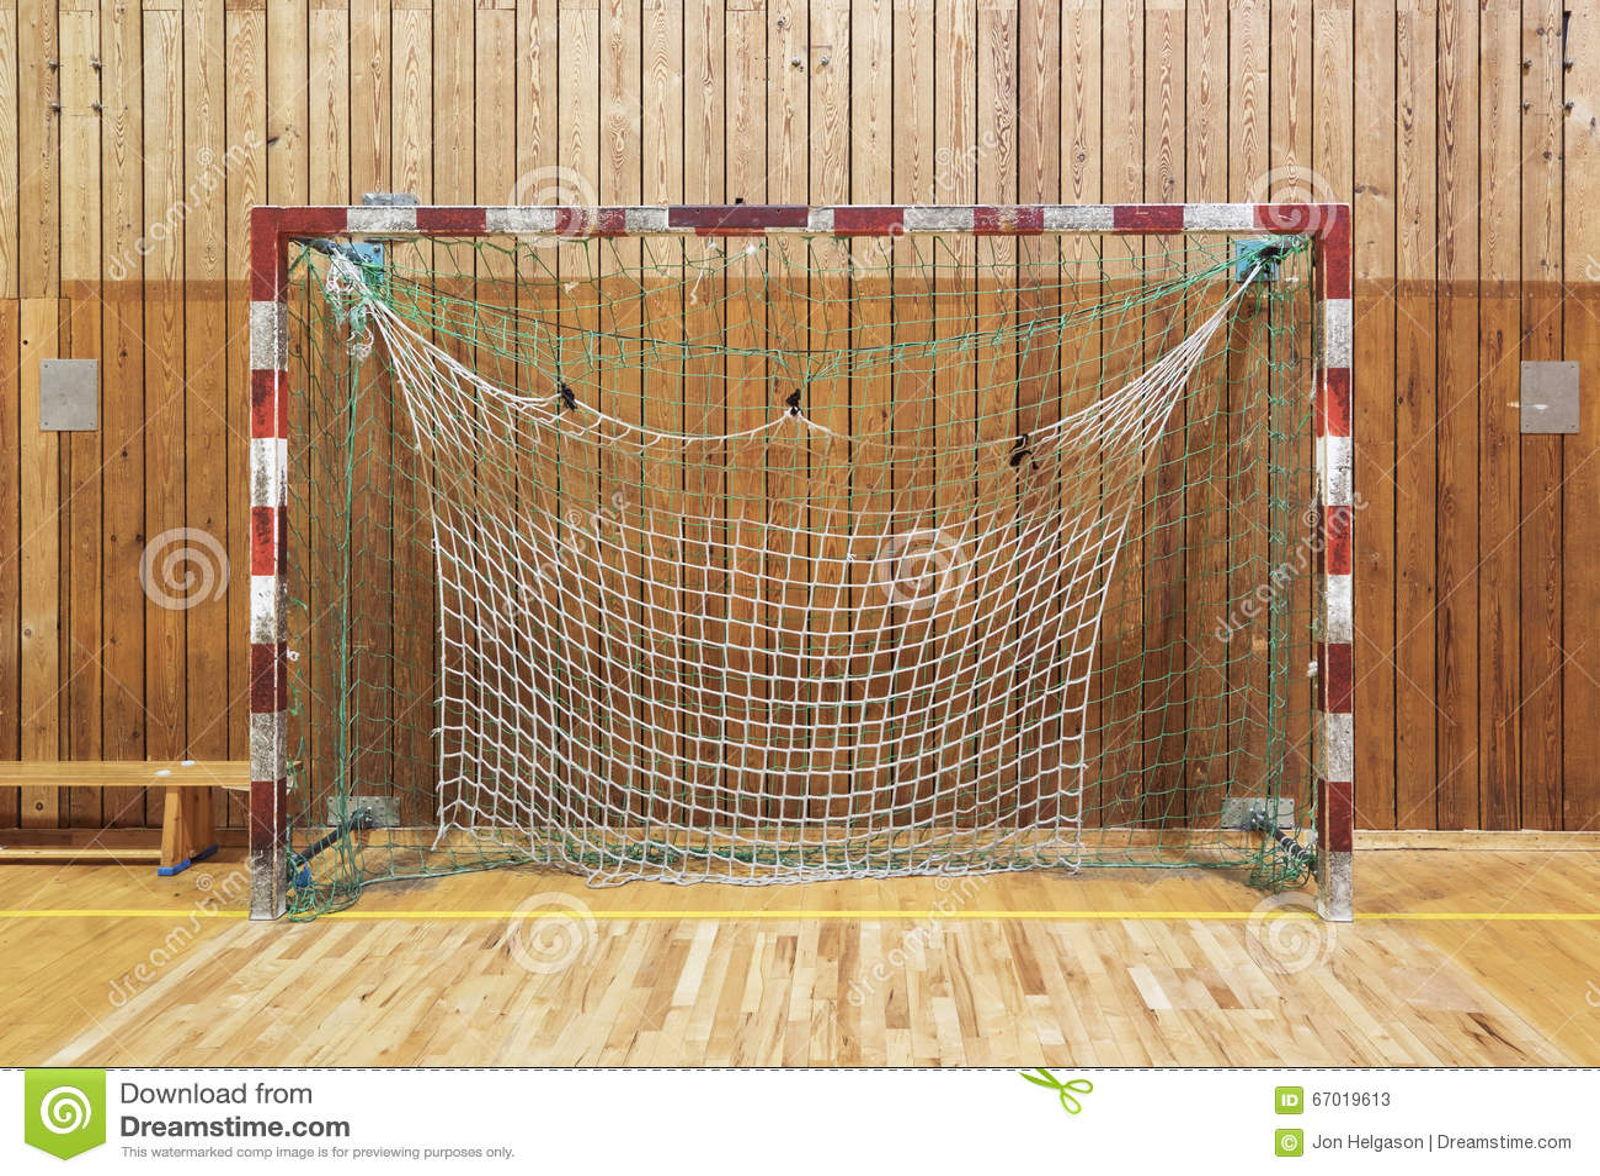 Stunning Indoor Soccer Goal Ideas - Amazing Design Ideas - luxsee.us